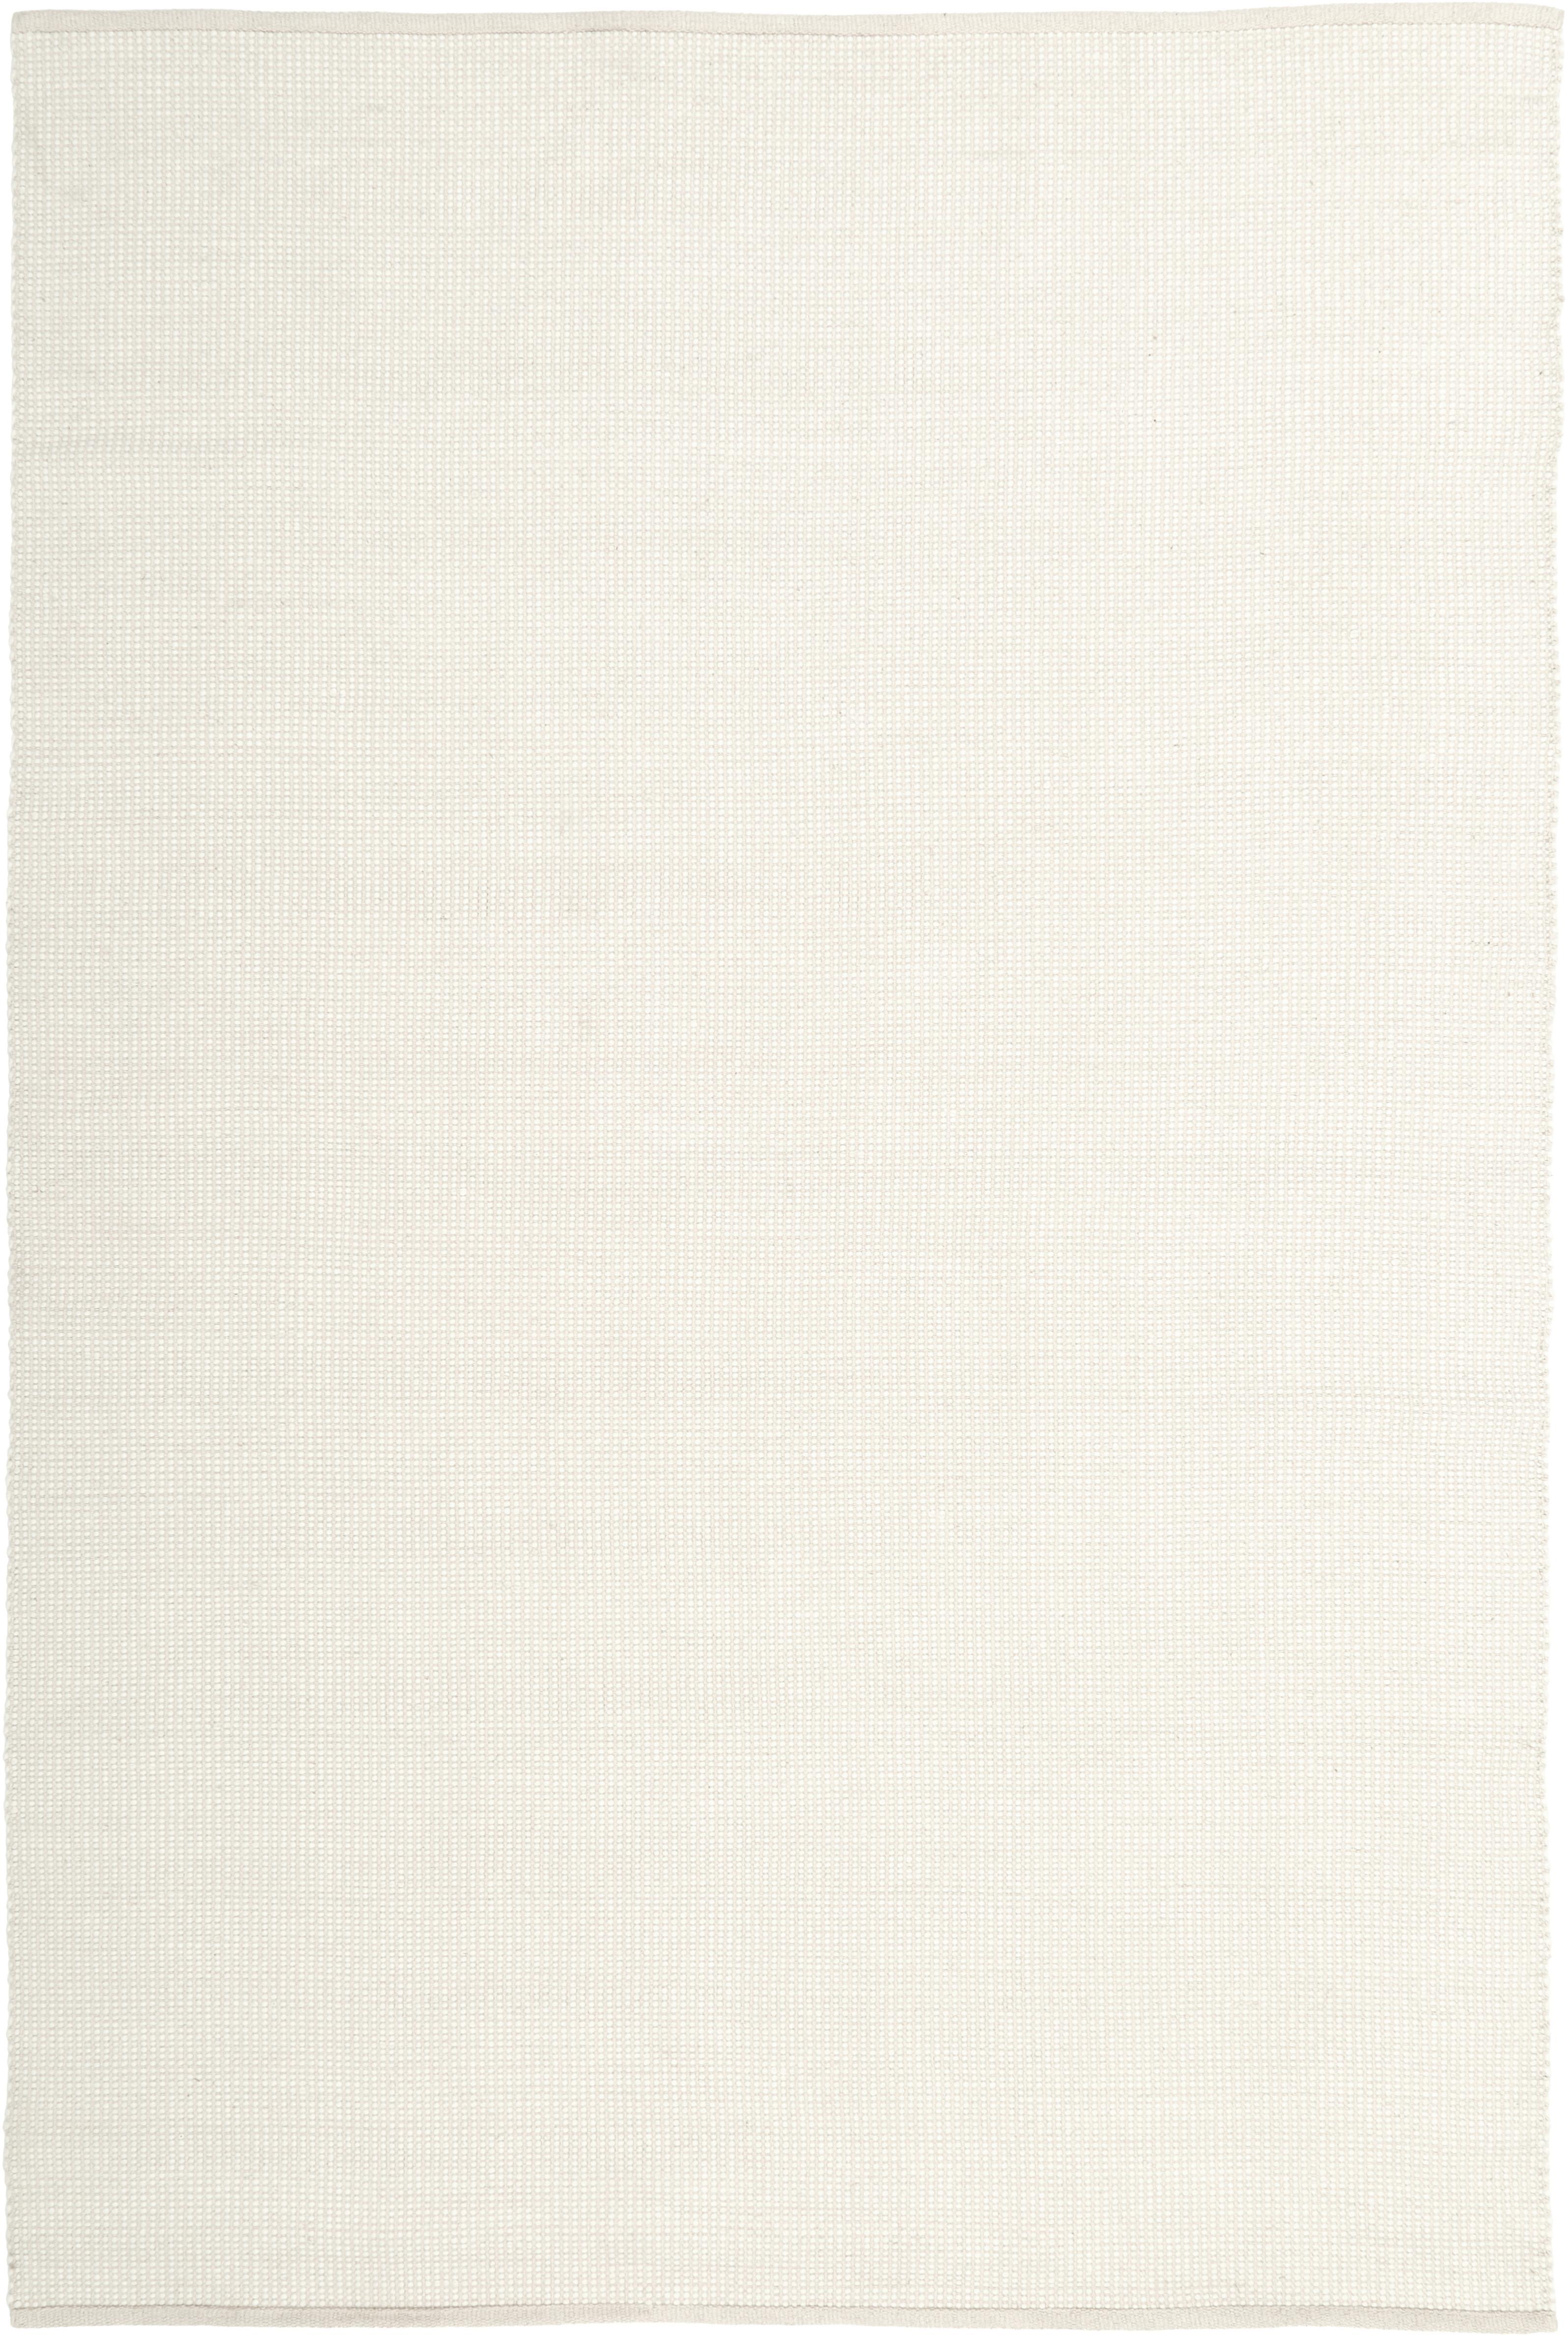 Alfombra artesanal de lana Amaro, 38%lana, 22%poliéster, 20%algodón, 20%poliamida, Blanco crema, An 120 x L 180  cm(Tamaño S)